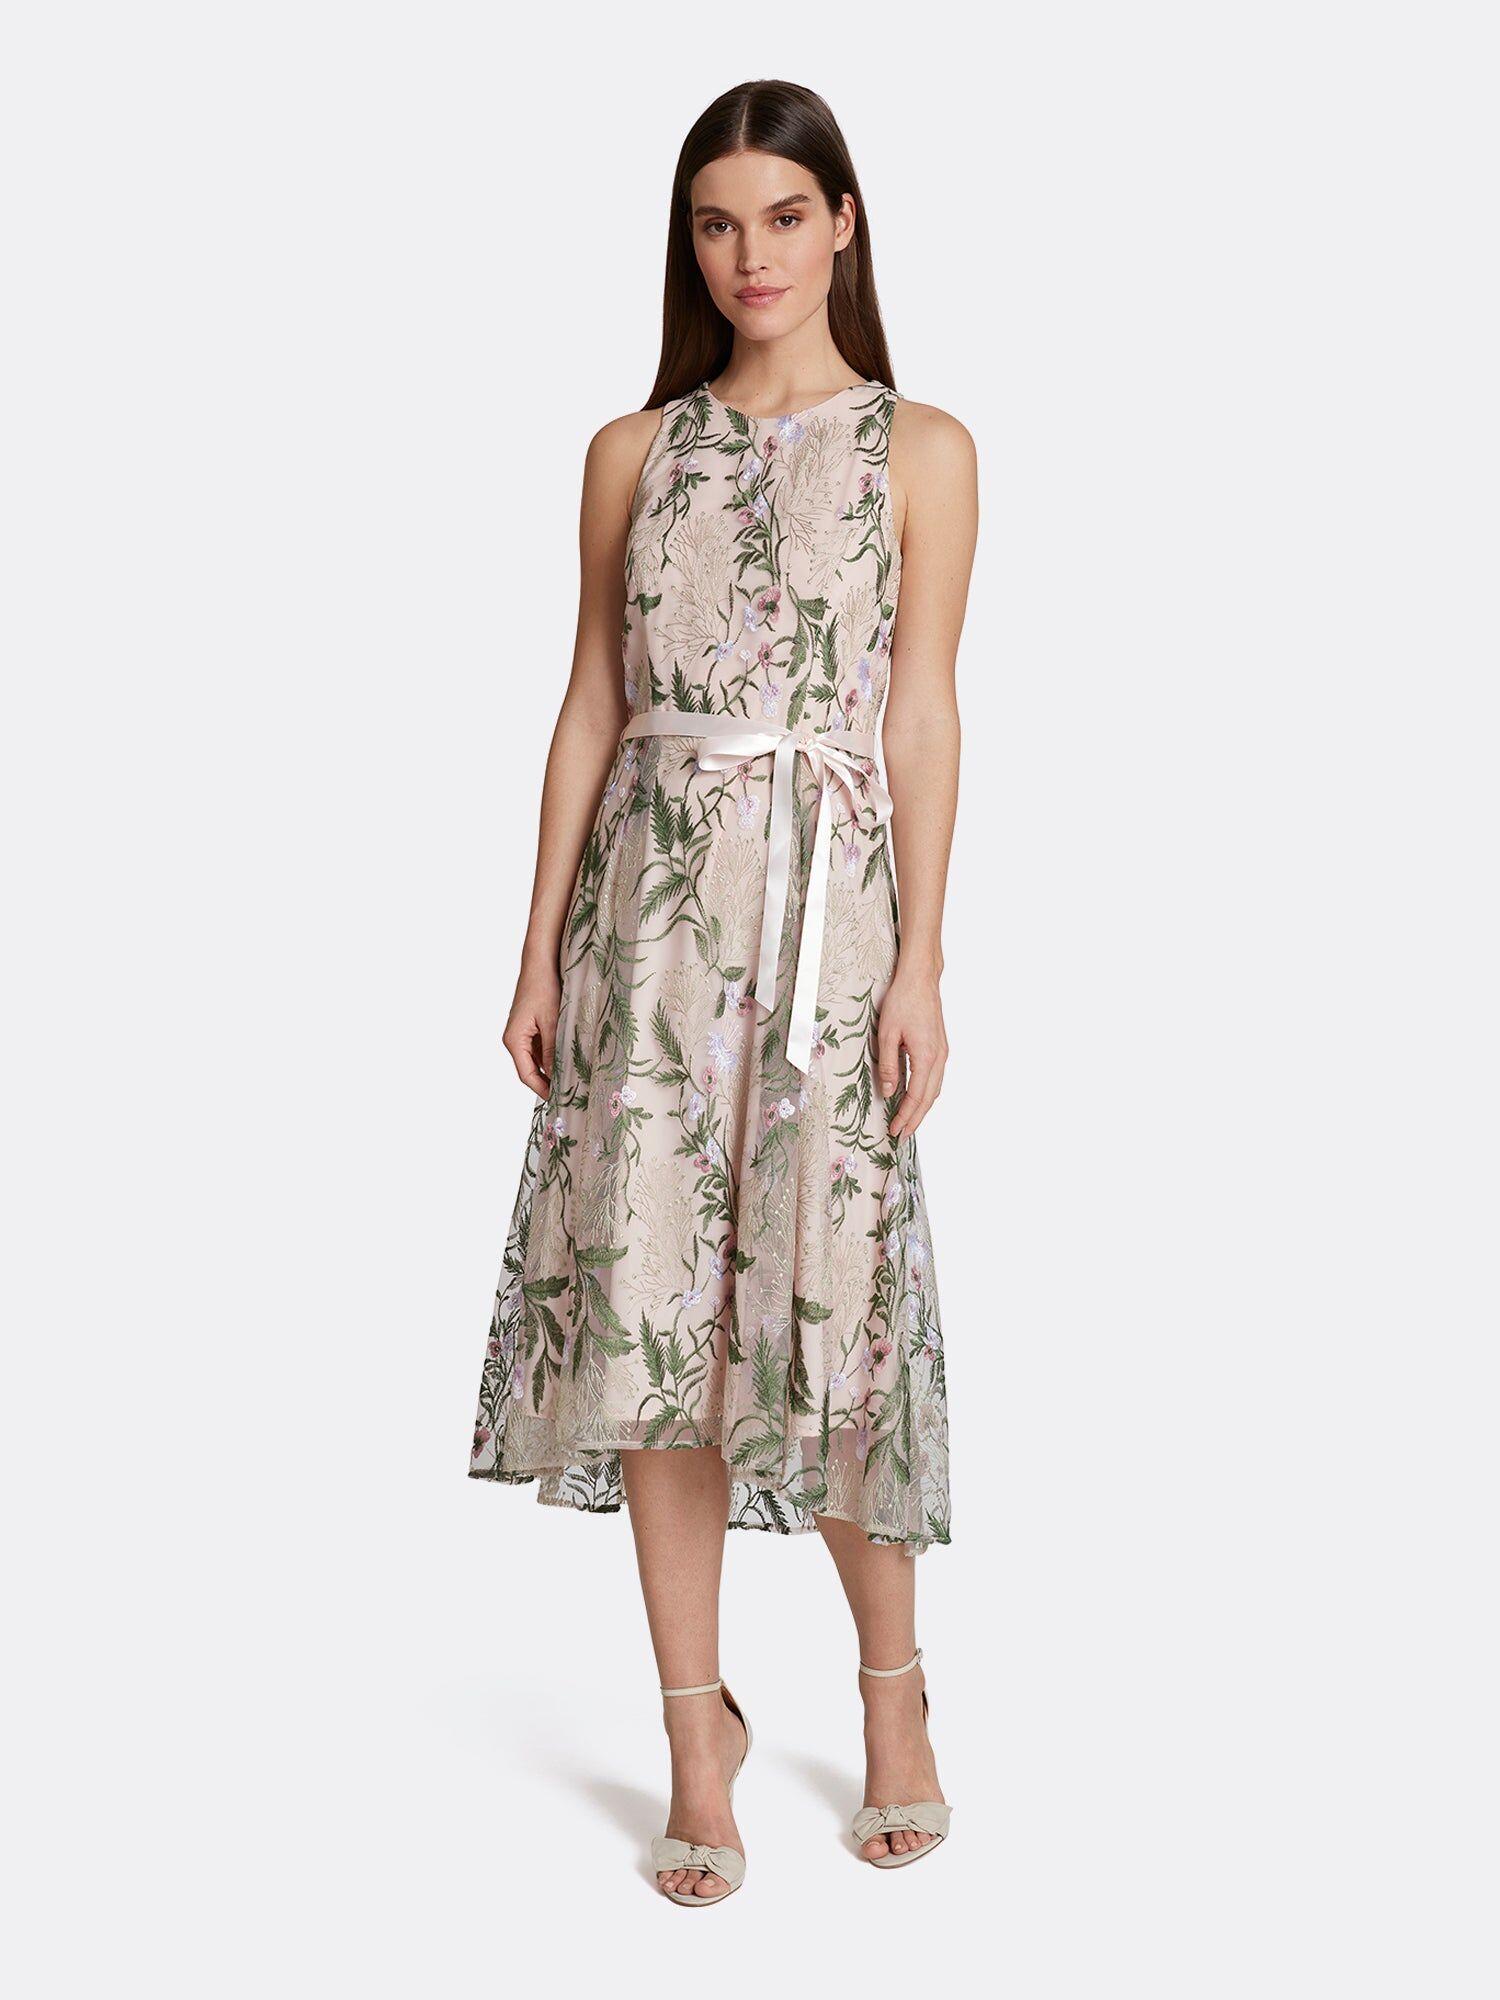 Tahari ASL Floral Embroidered Hi-Low Petite Dress Blush Multi Embroidery 8P